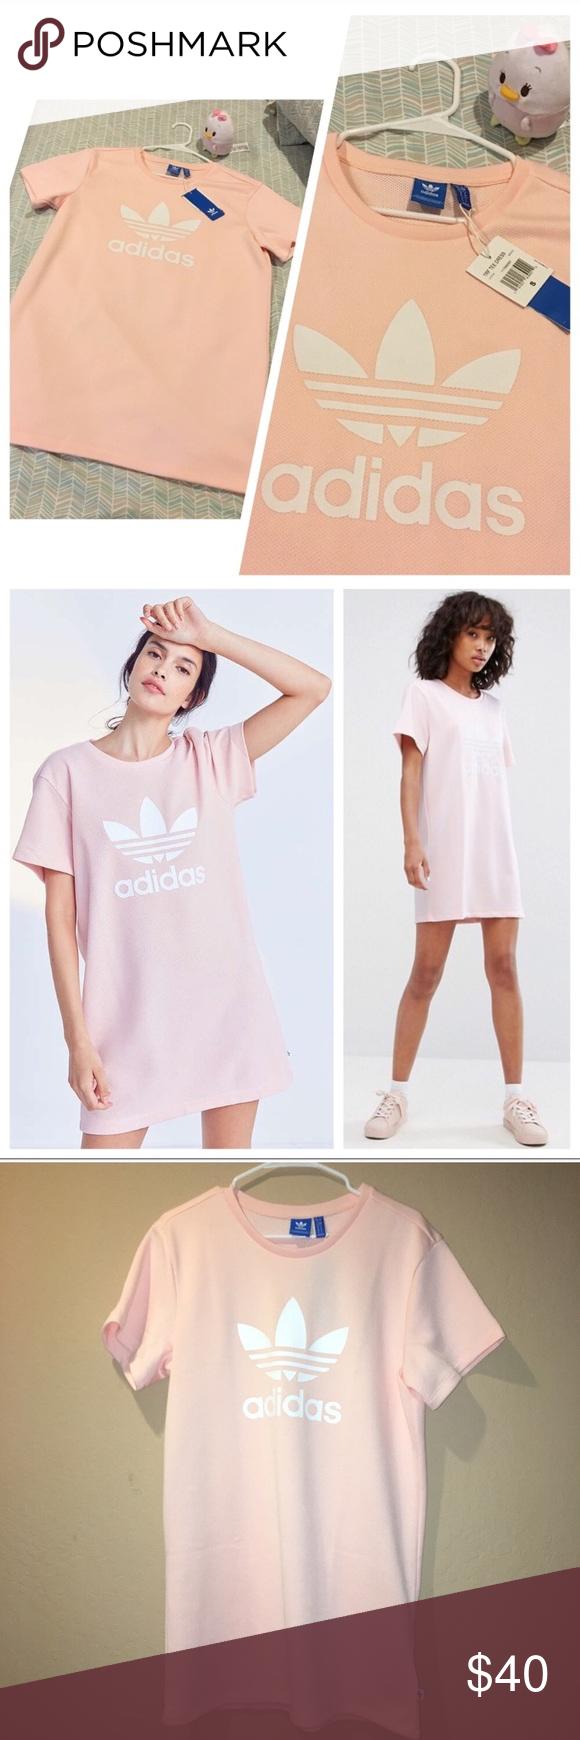 6a6dc52ac4f6 Adidas Pink Trefoil Tee Dress   Adidas sporty   chic Trefoil t-shirt dress  in